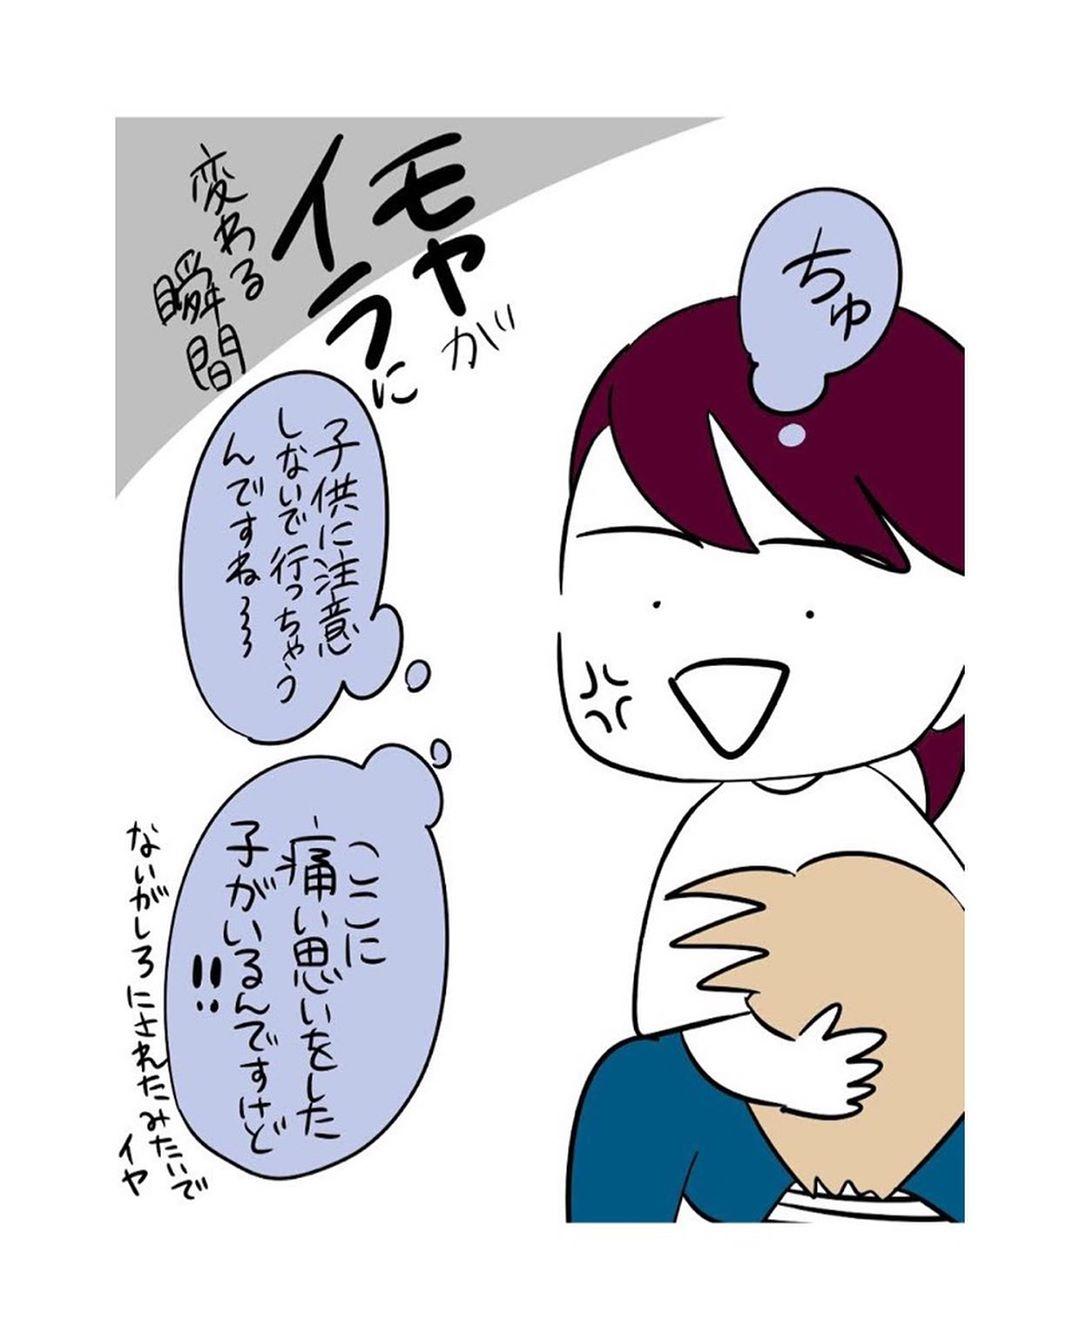 shirota.yunya_75443199_533969570775390_4559825165488740168_n